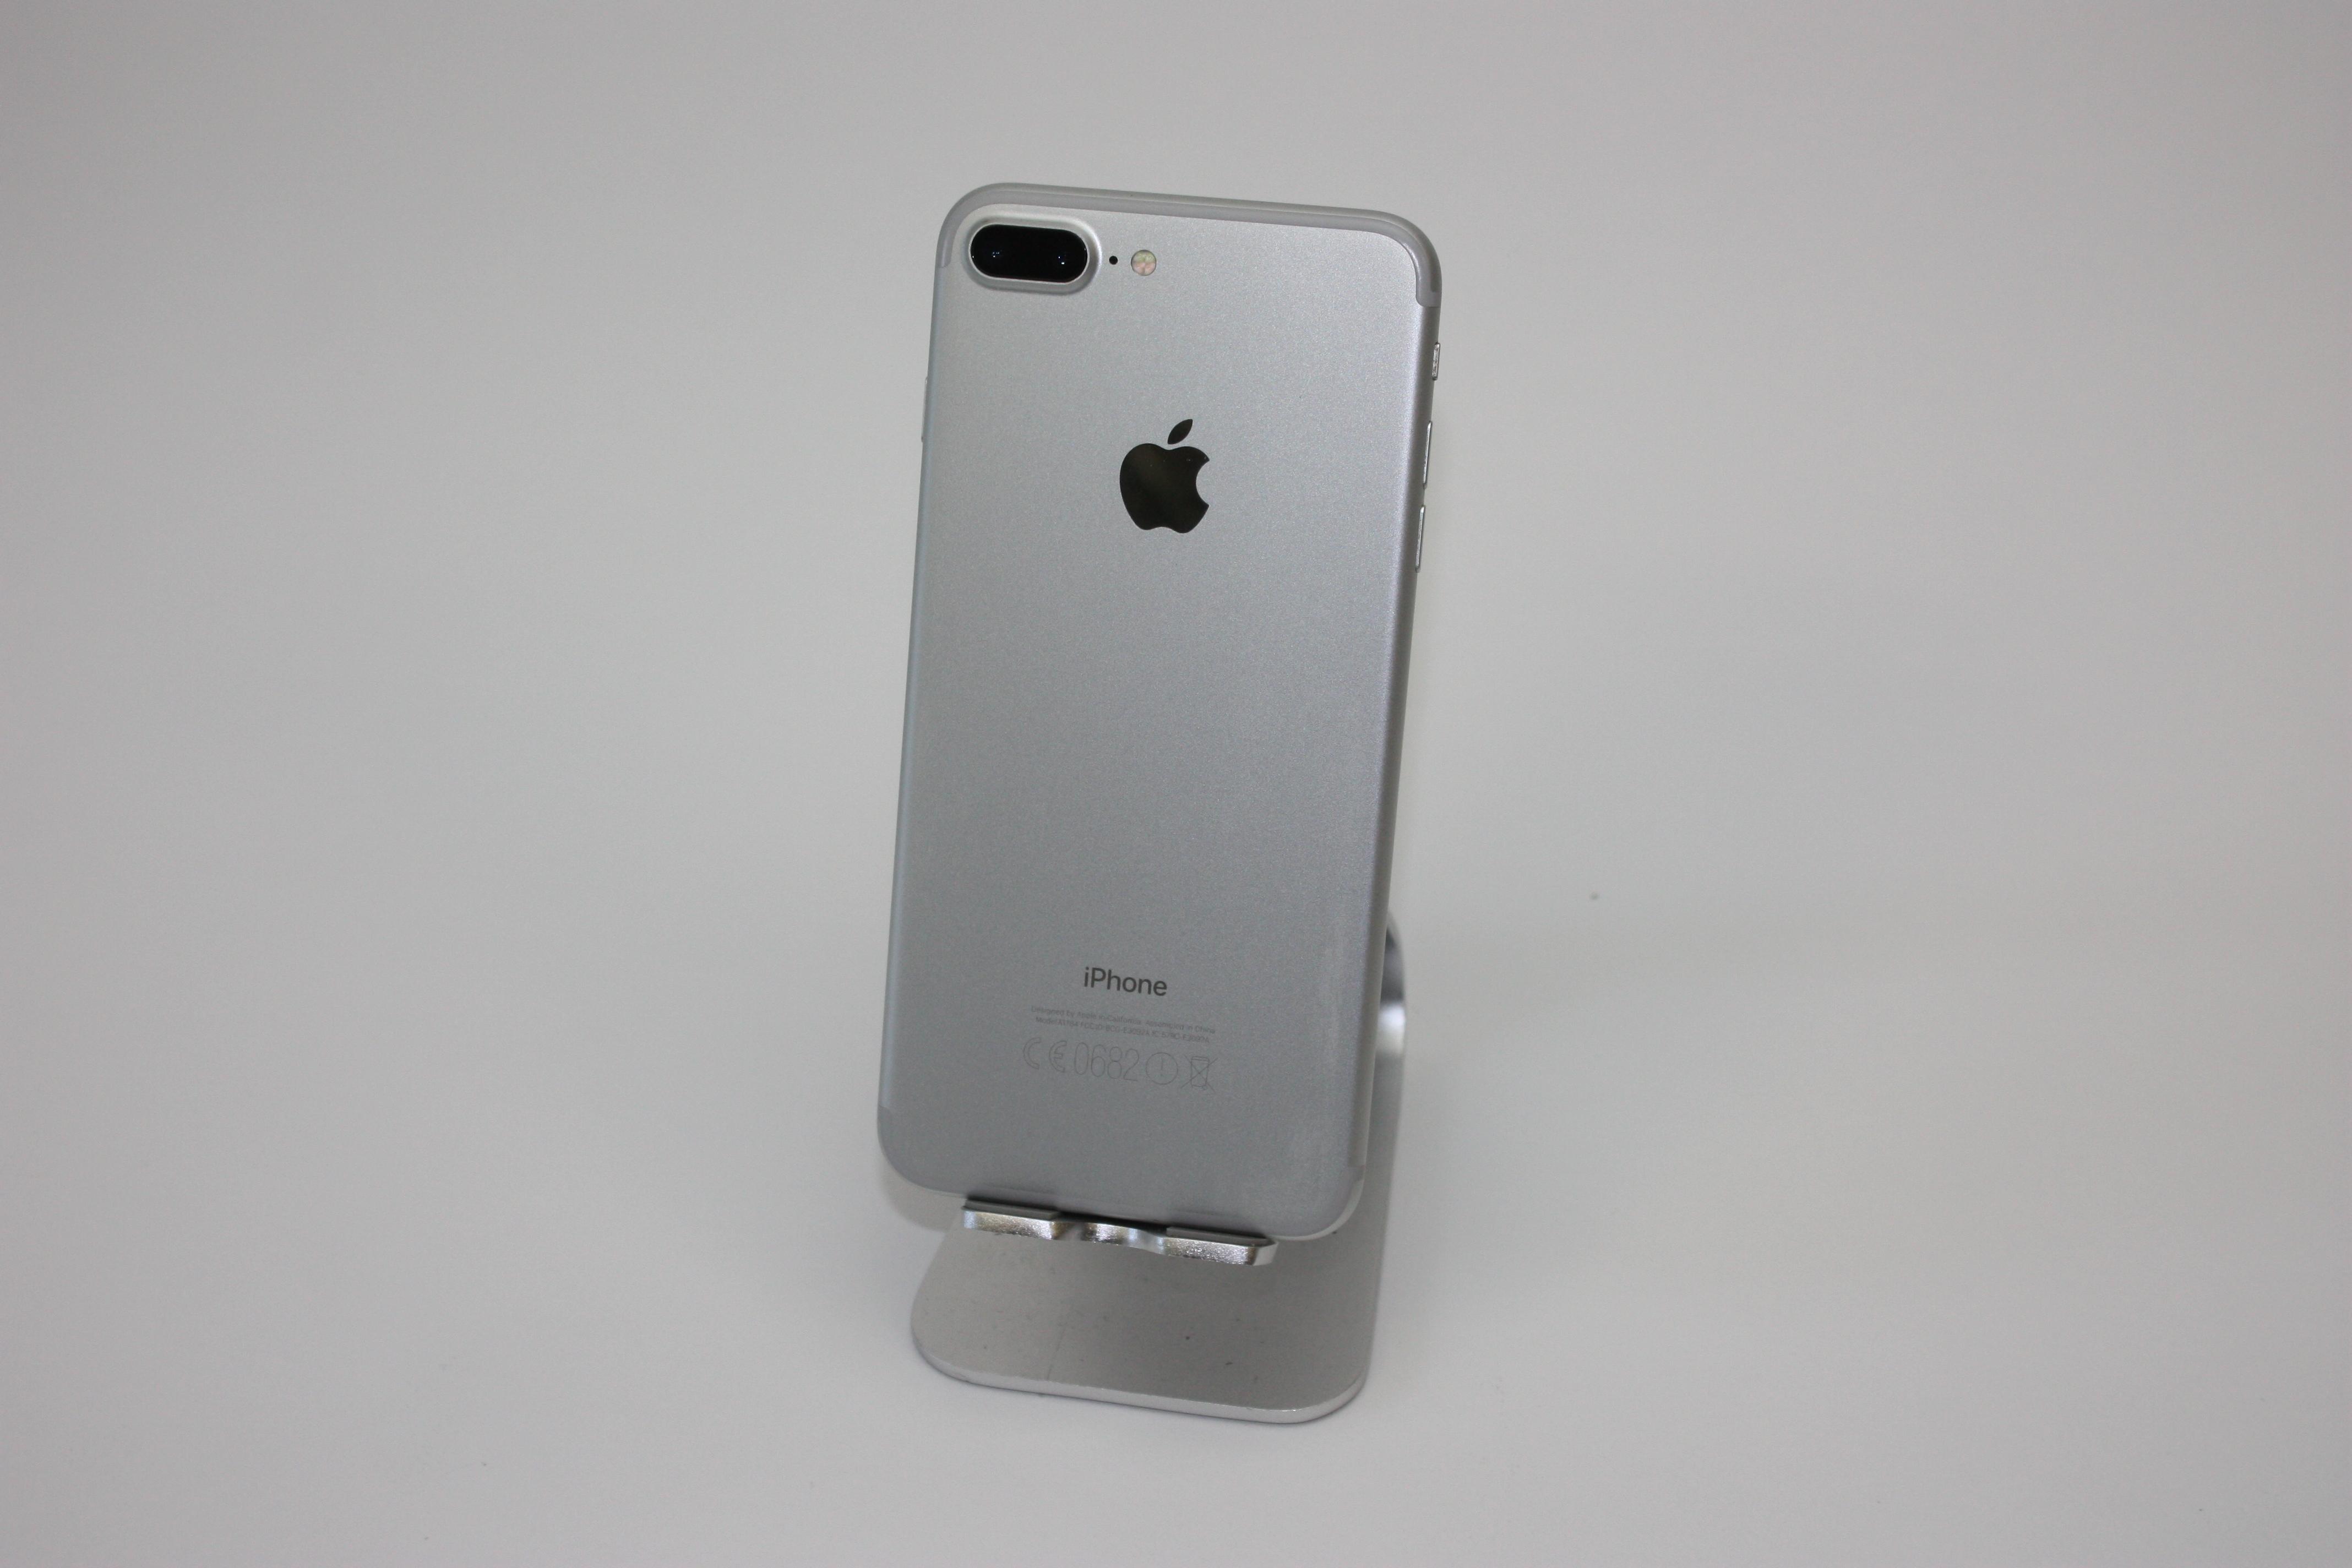 iPhone 7 Plus 128GB, 128 GB, Silver, image 2